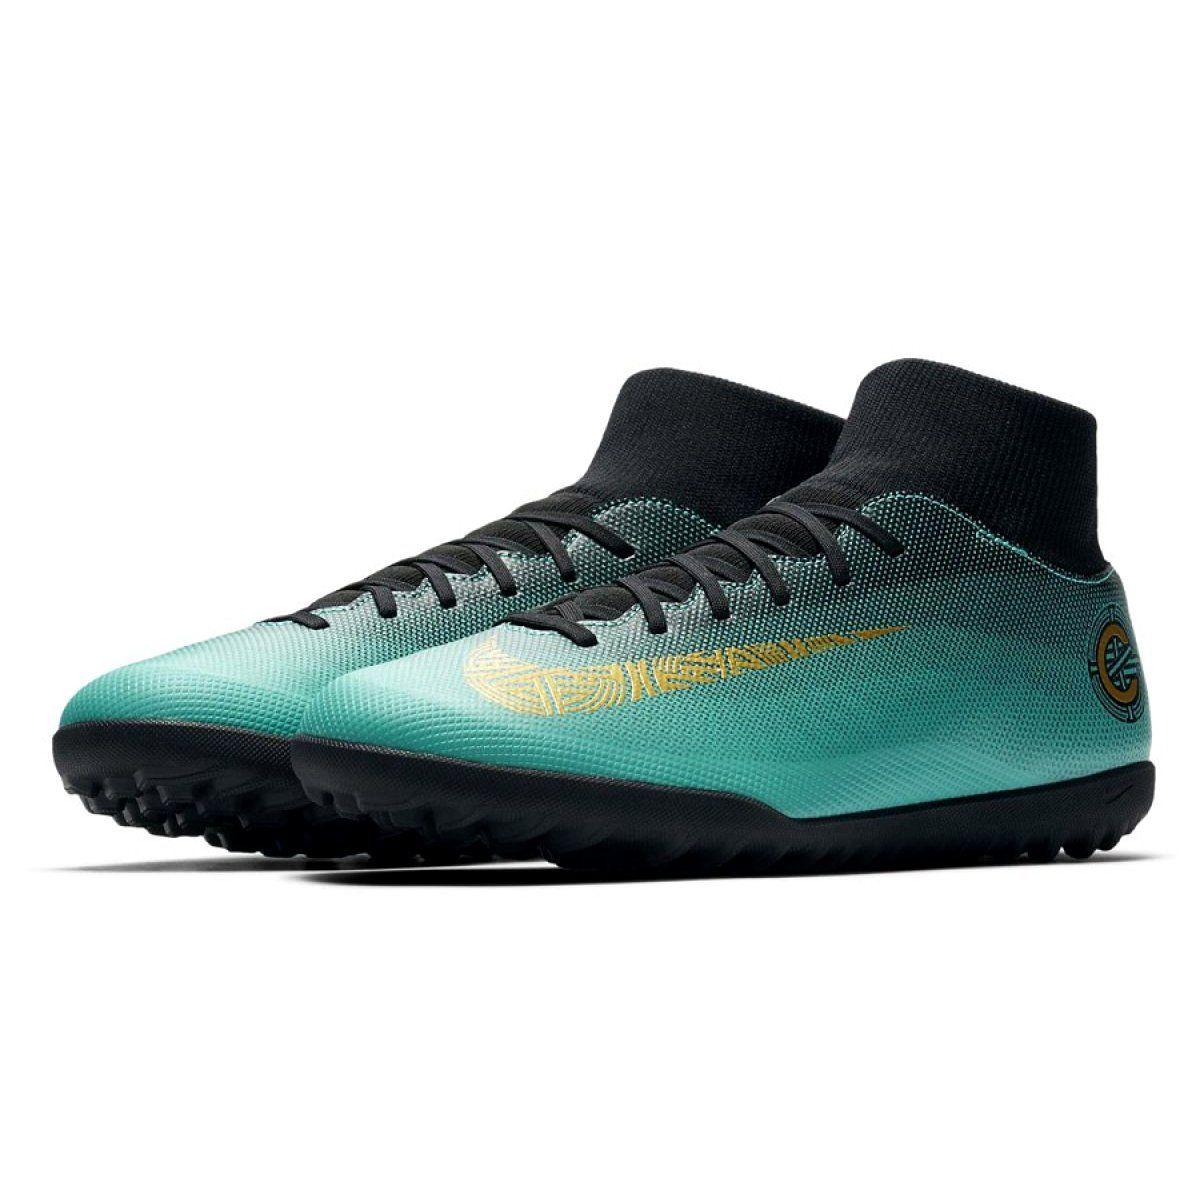 Buty Pilkarskie Nike Mercurialx 6 Club Cr7 Tf Aj3570 390 Niebieskie Niebieskie Hoka Running Shoes Running Shoes Sport Shoes